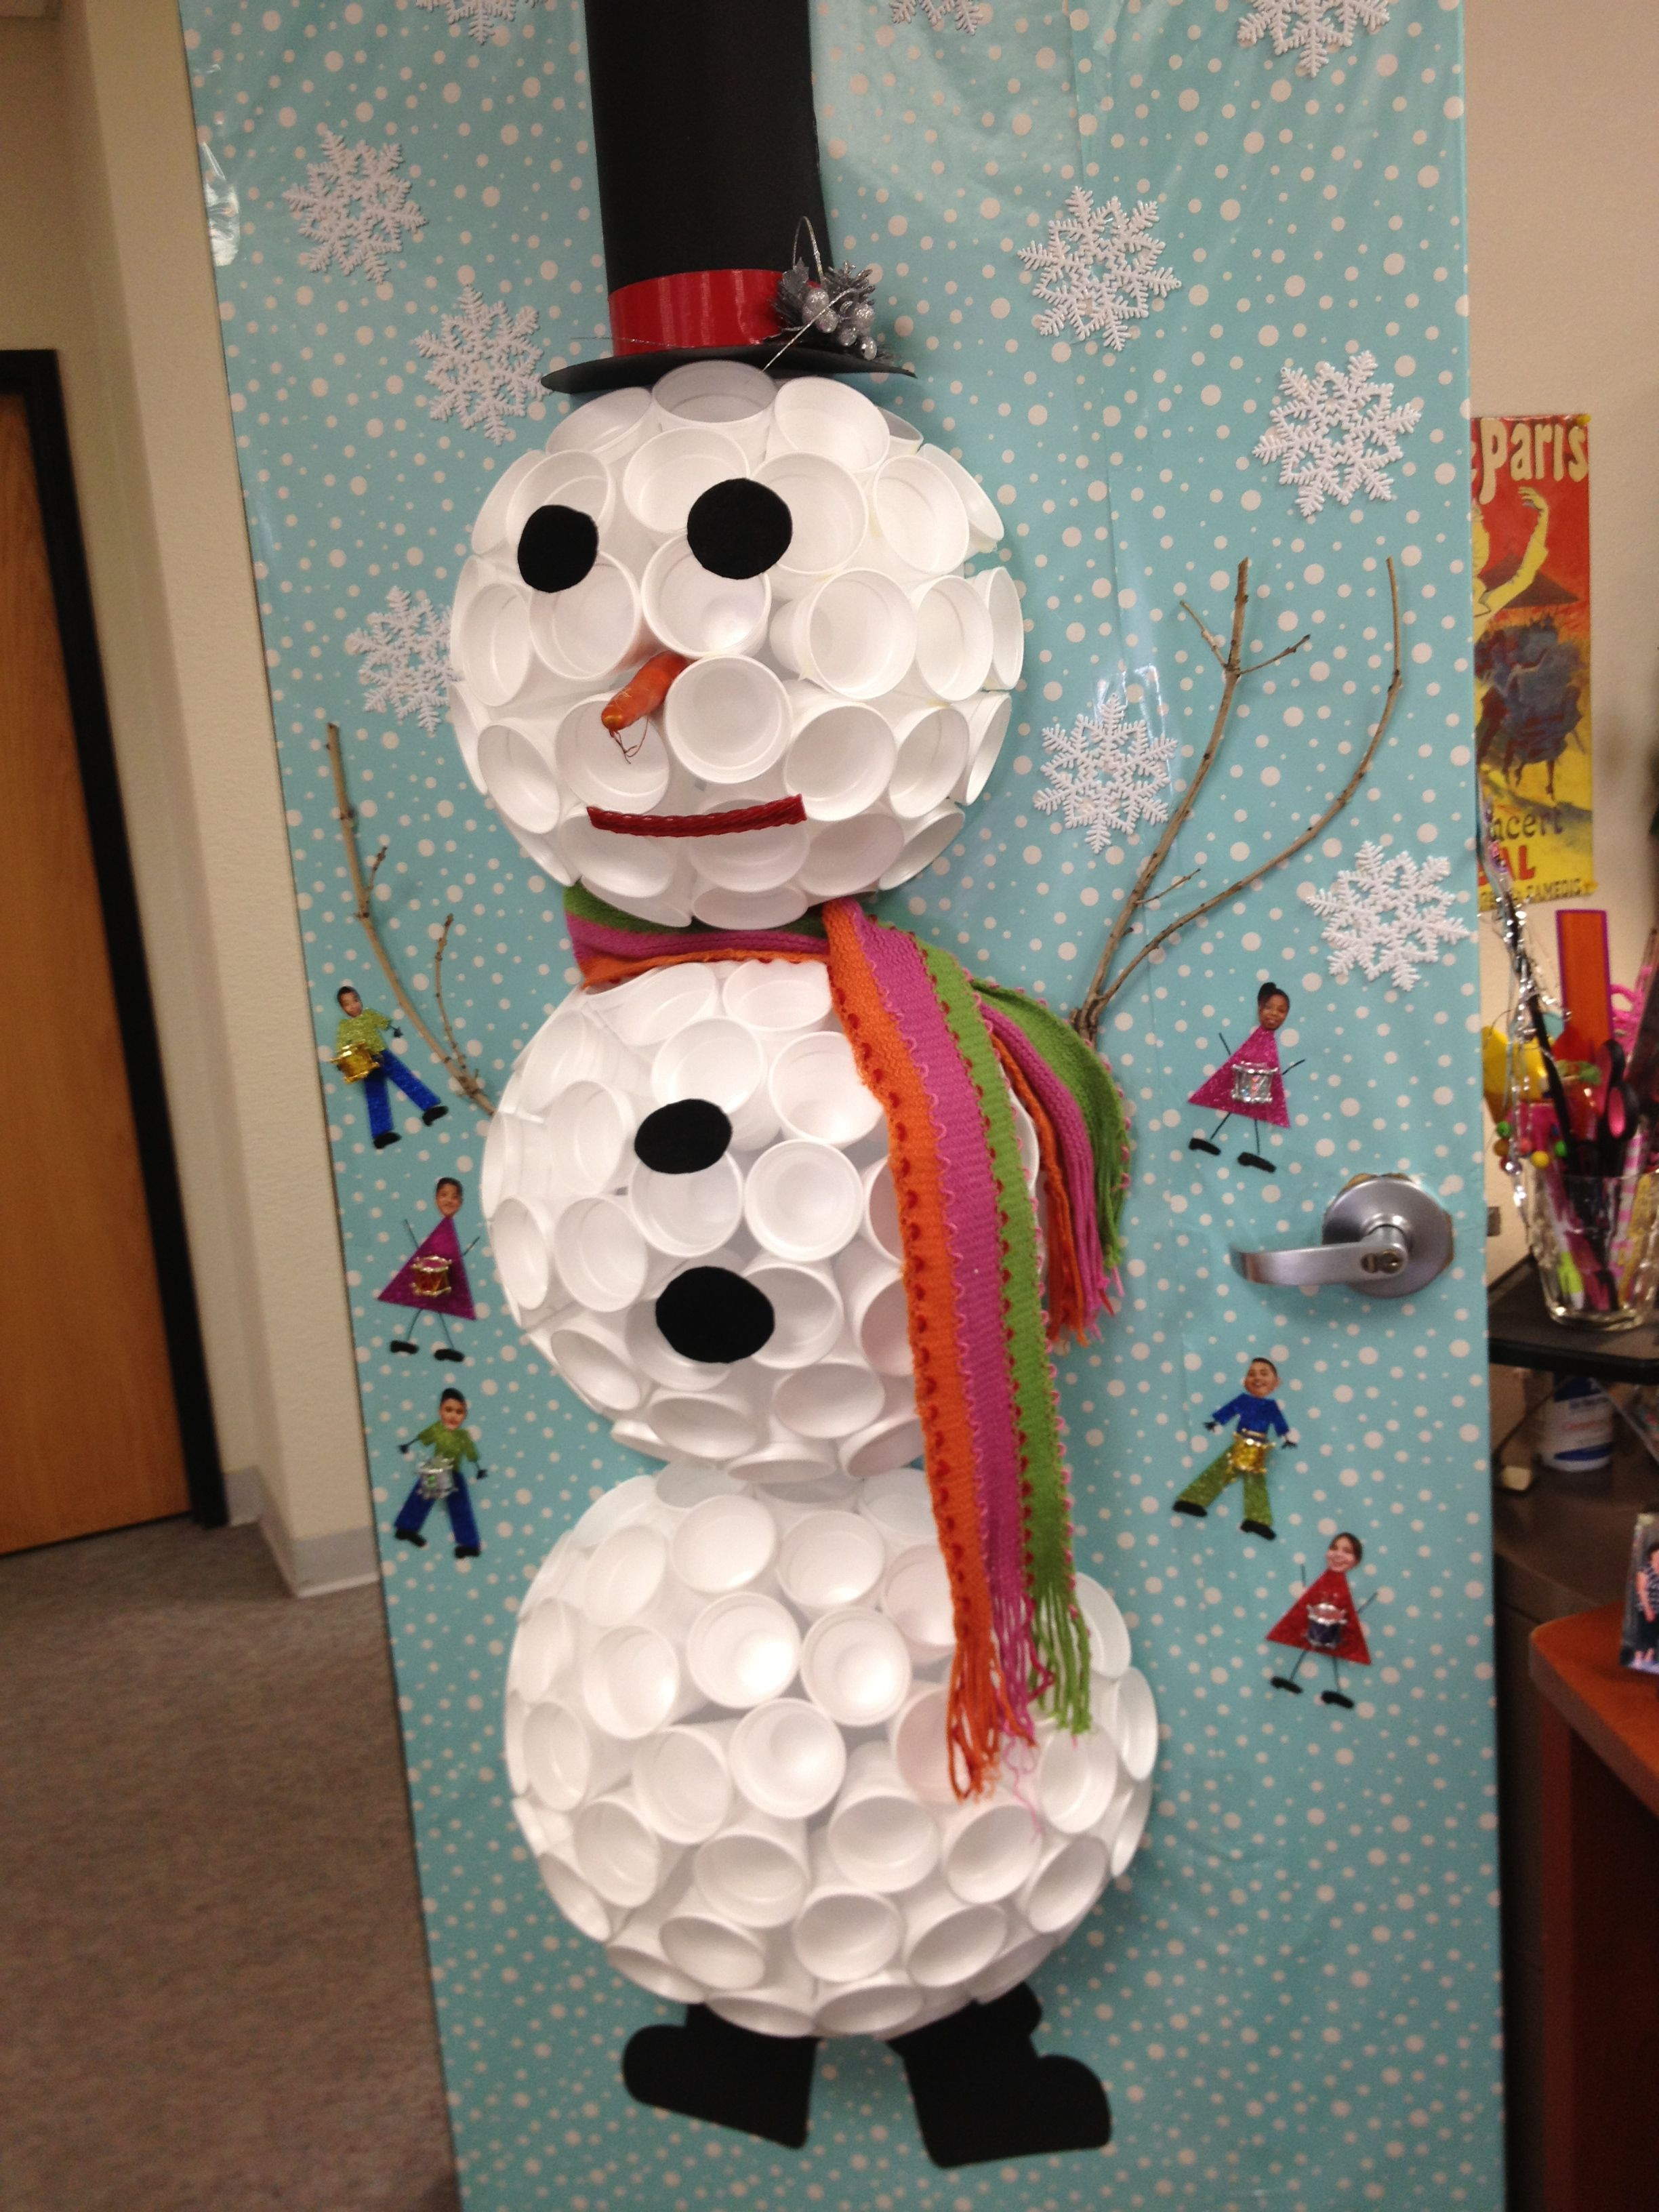 Styrofoam cup snowman get crafty pinterest for Cup snowman